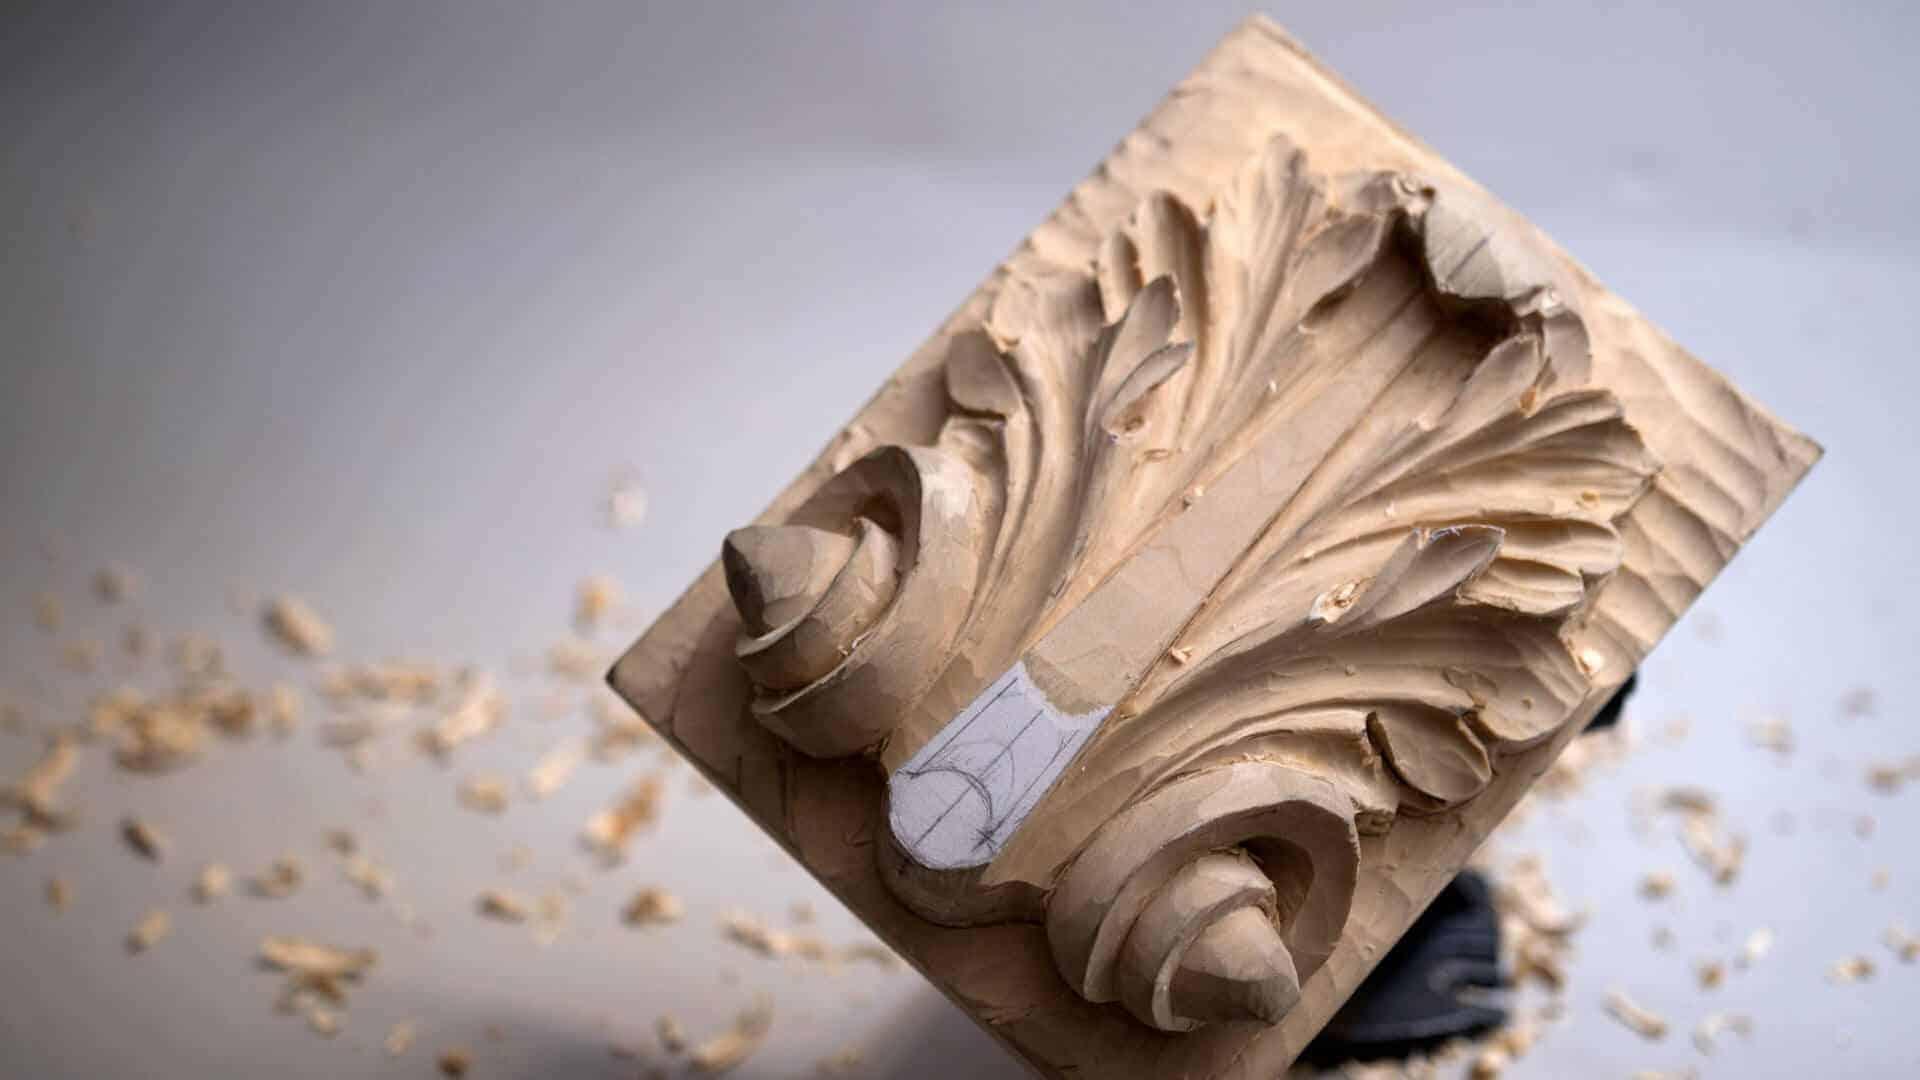 Carving Roman Acanthus 2 Grabovetskiy School Of Wood Carving